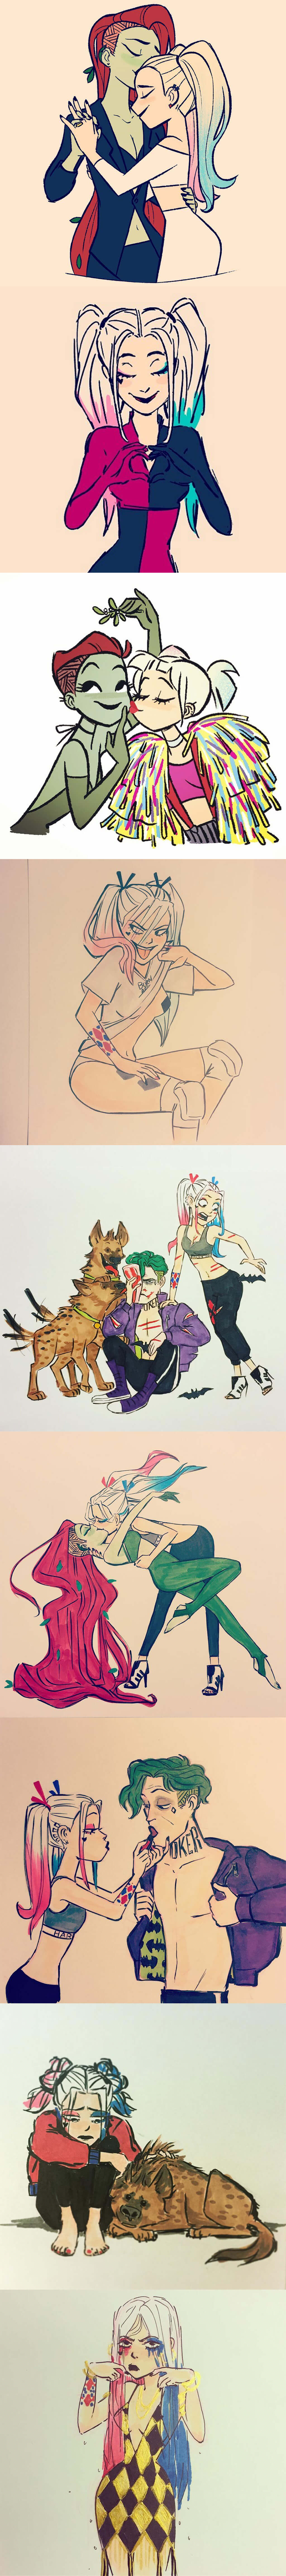 Harley Quinn Fanart by Erin Kavanagh